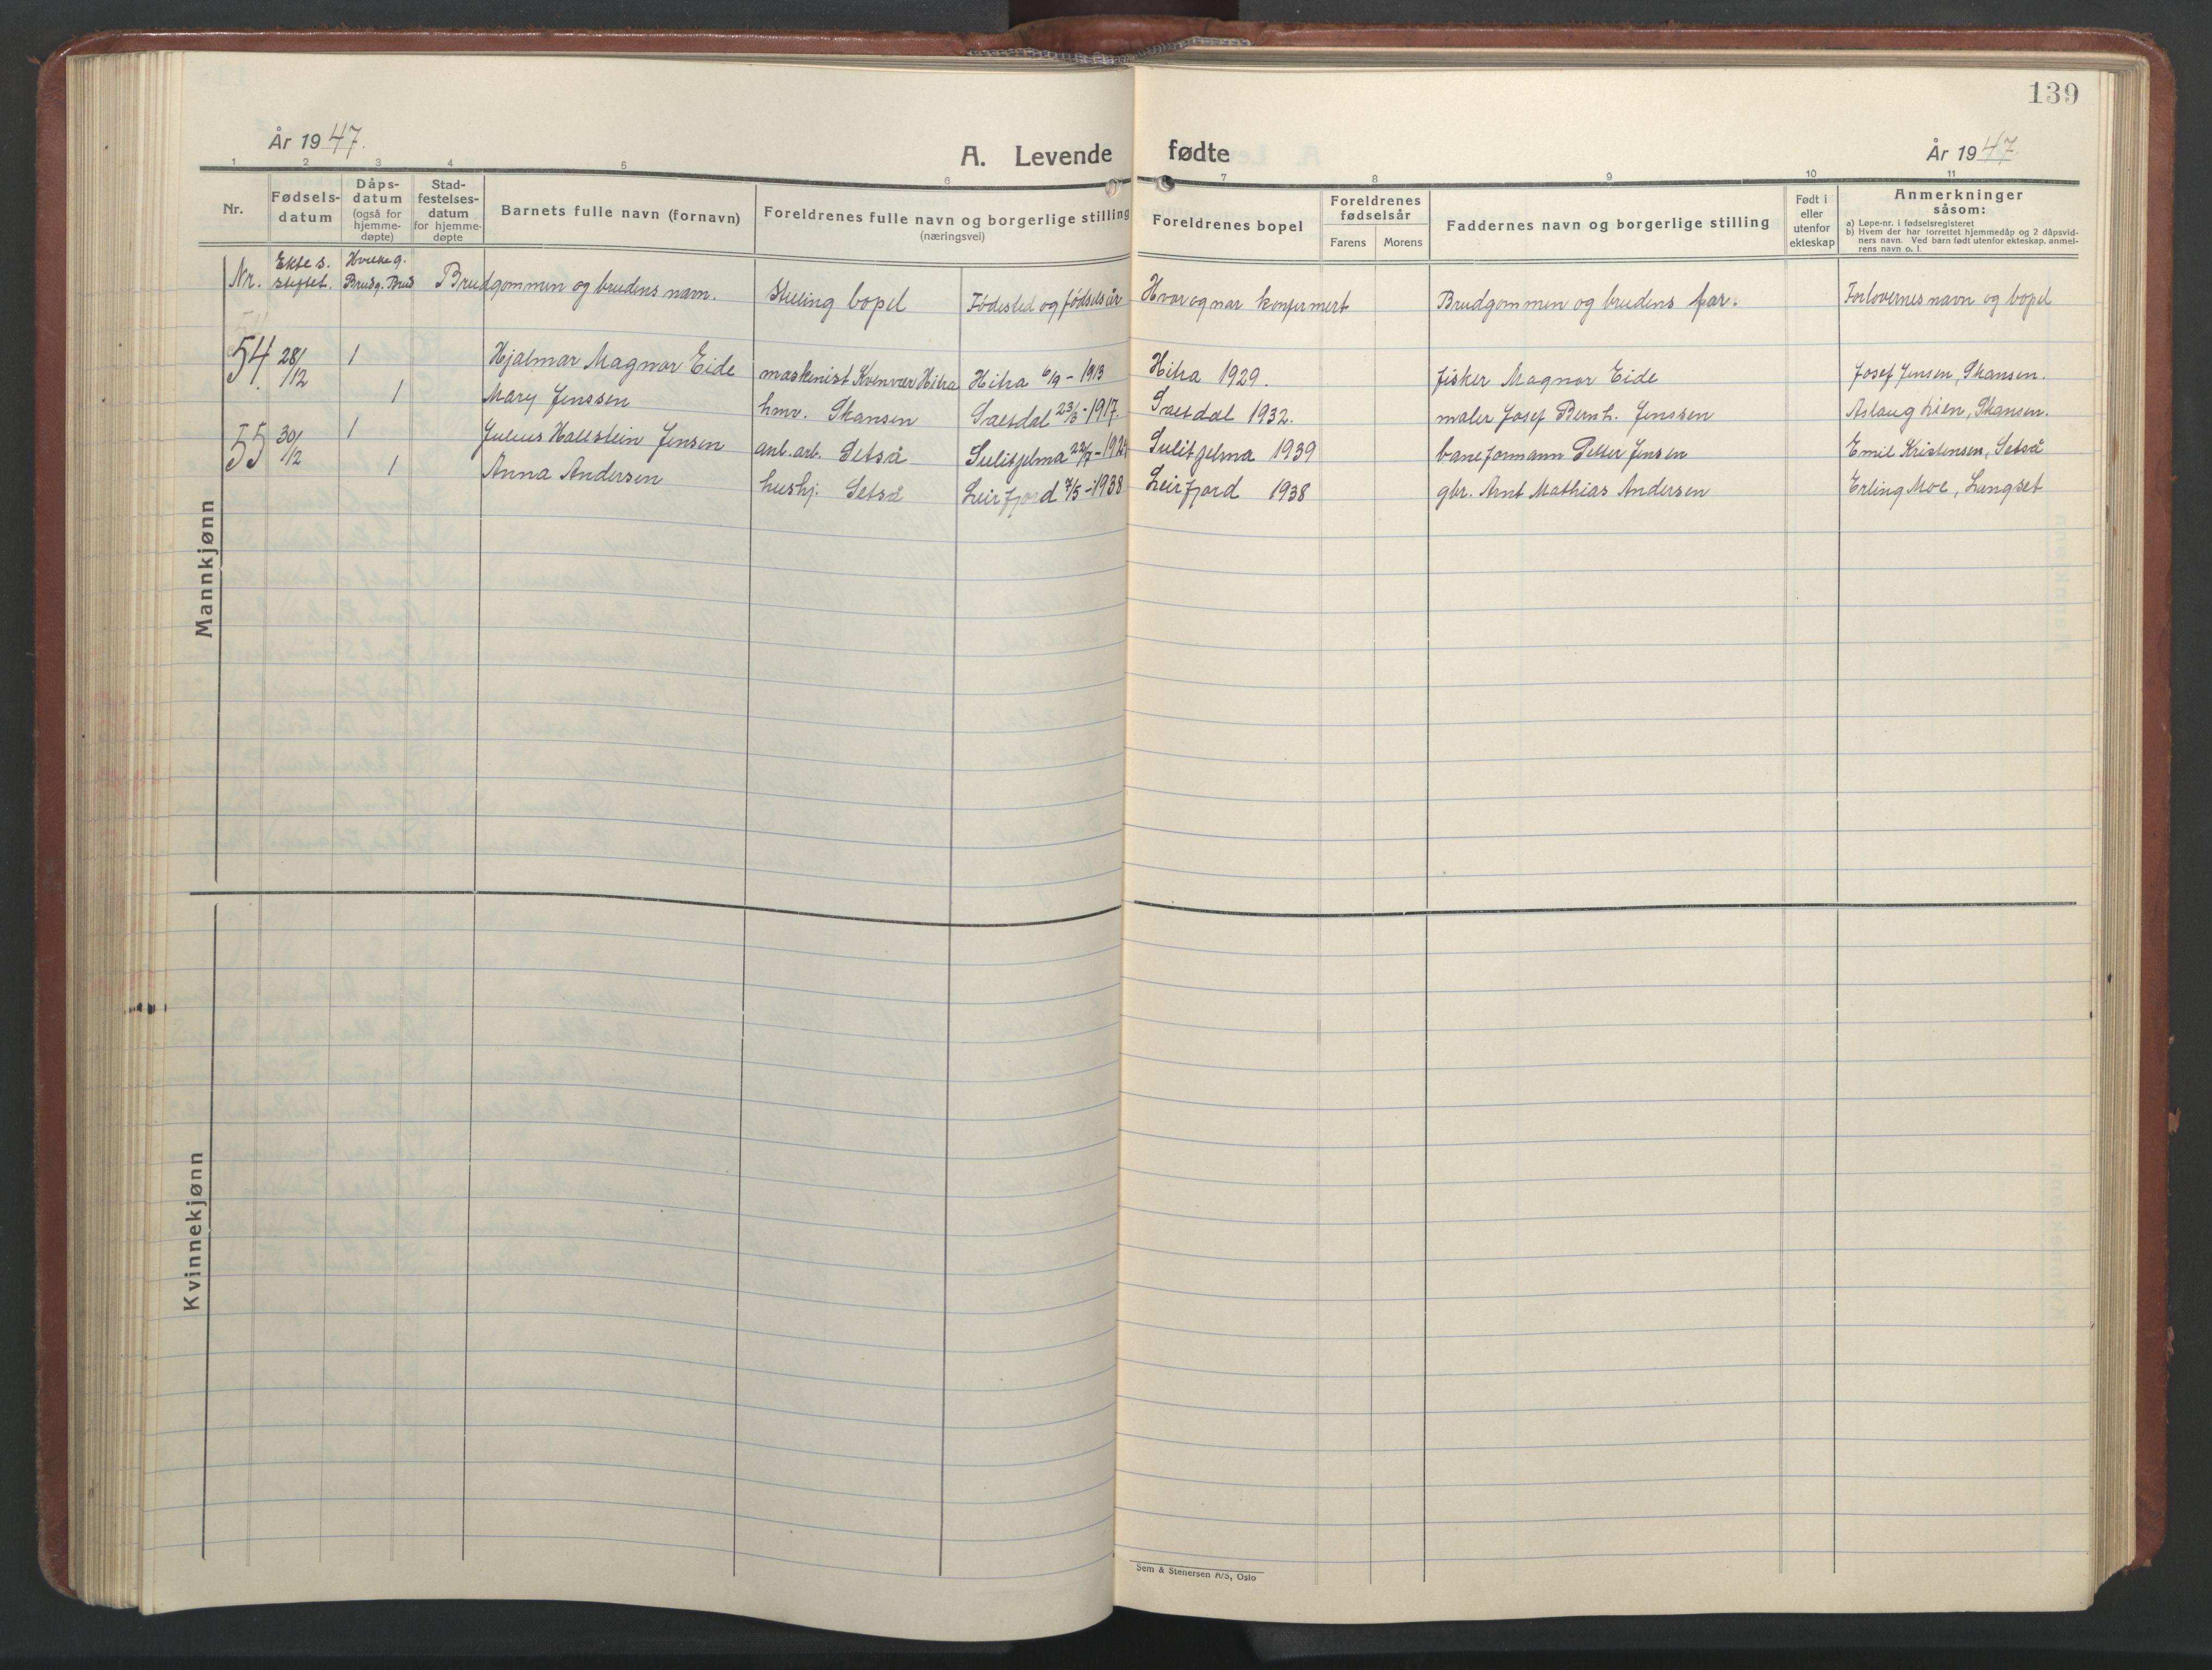 SAT, Ministerialprotokoller, klokkerbøker og fødselsregistre - Nordland, 847/L0680: Klokkerbok nr. 847C08, 1930-1947, s. 139